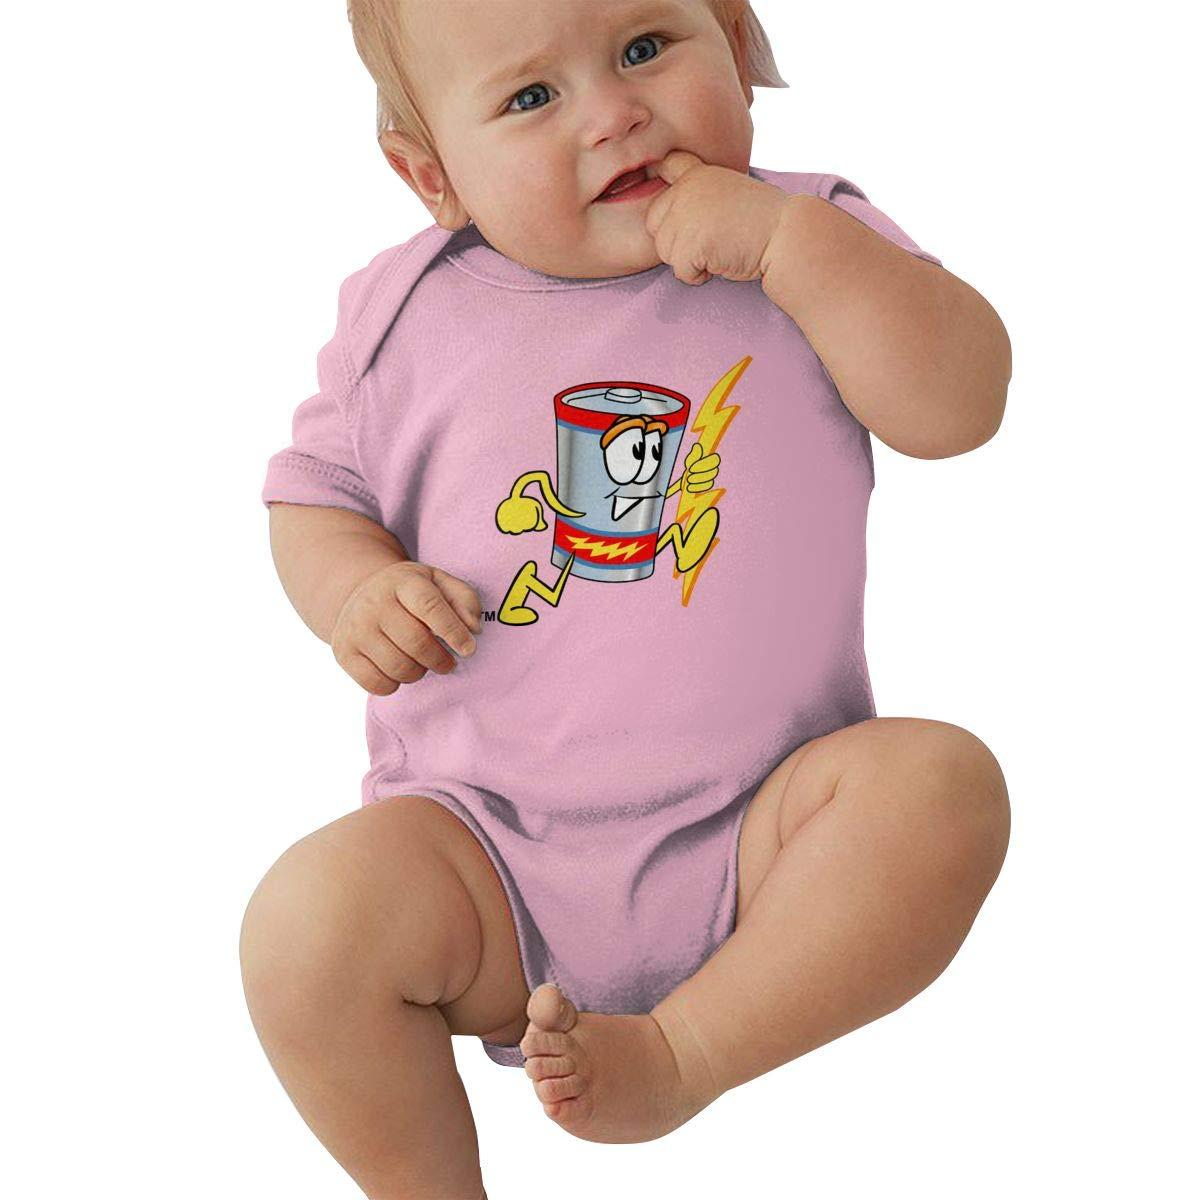 Dfenere Cute Fashion Newborn Baby Short Sleeve Bodysuit Romper Infant Summer Clothing Black